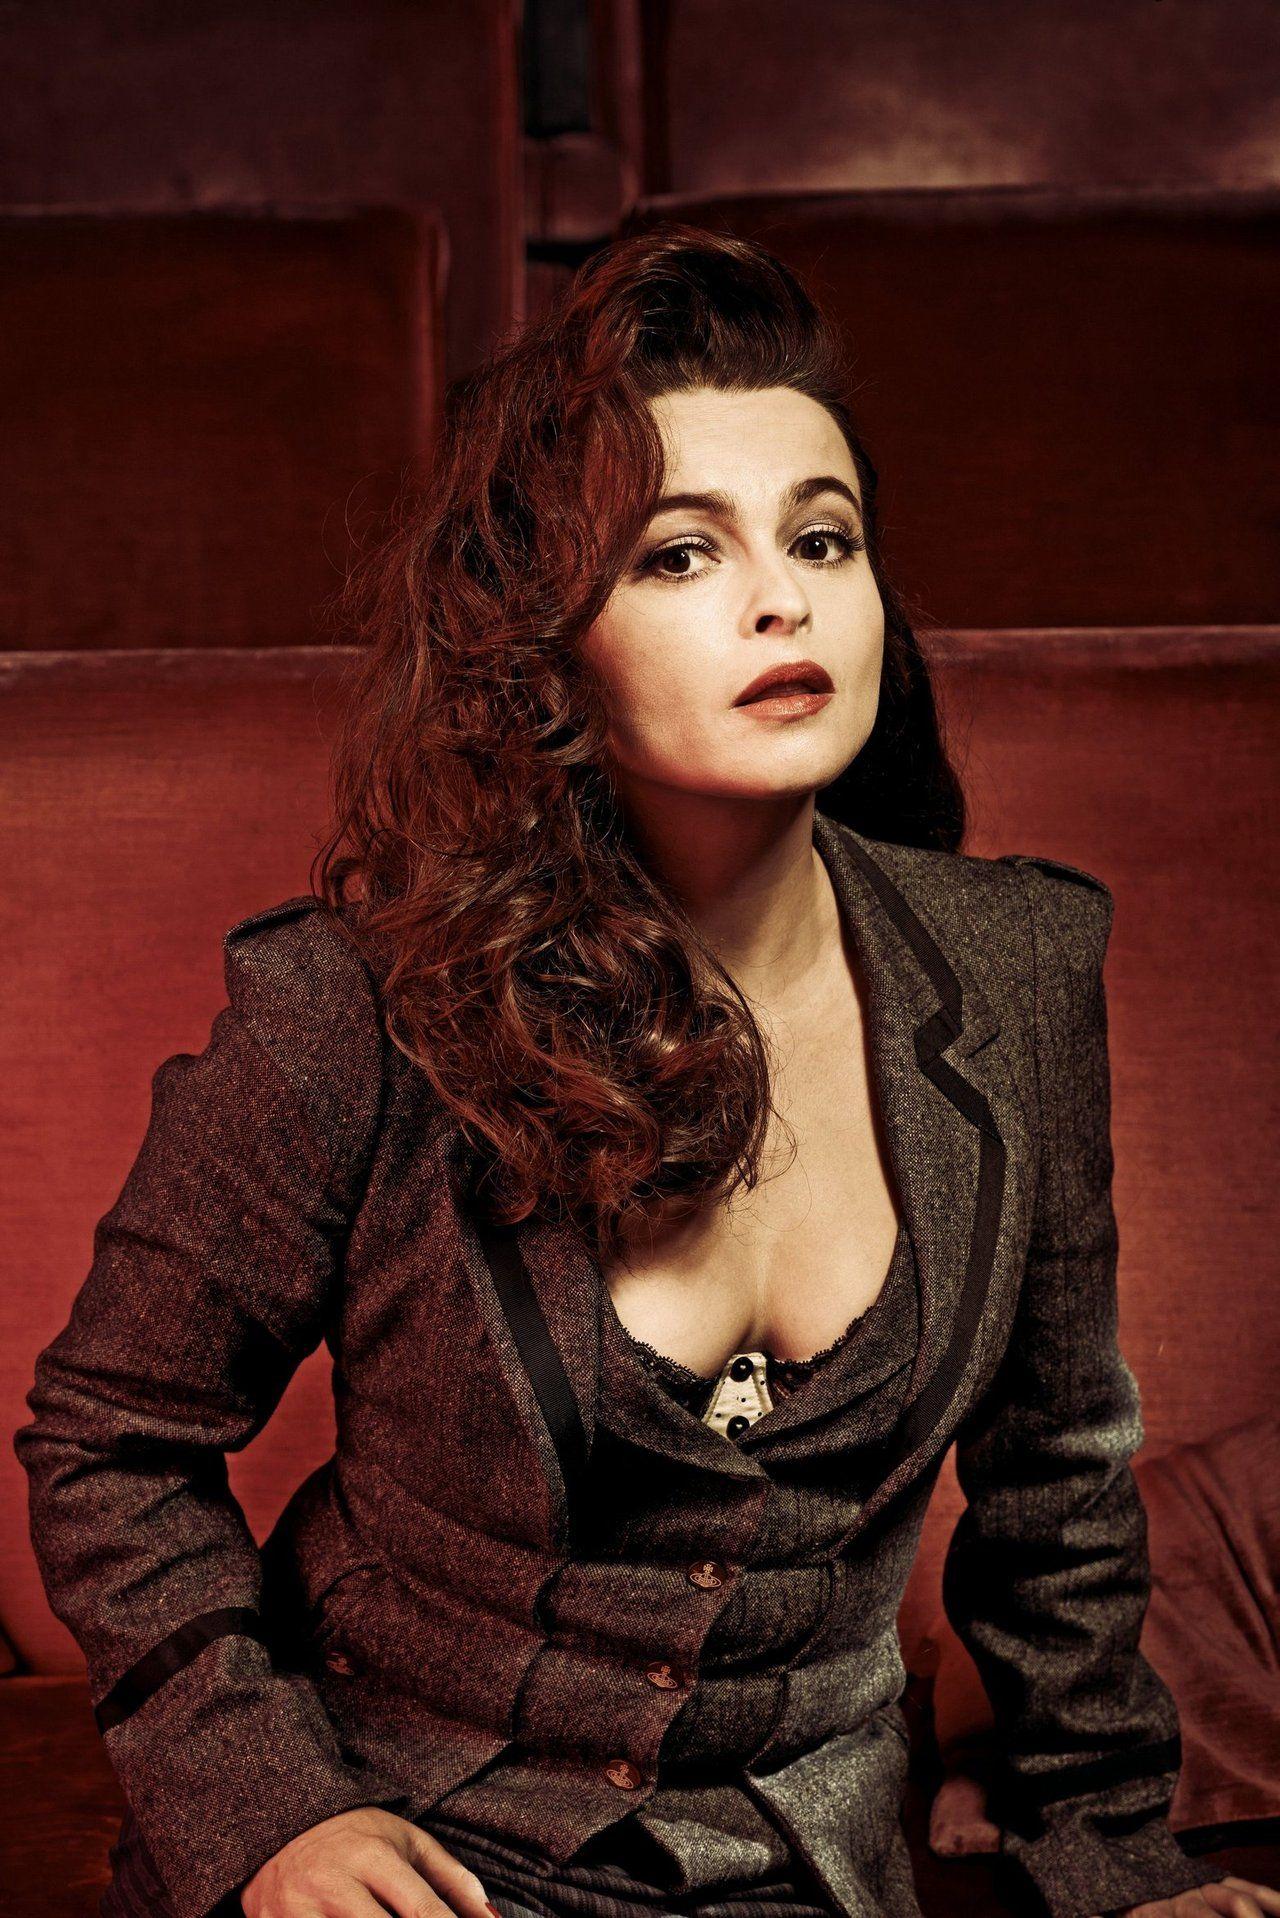 Watch Helena Bonham Carter (born 1966) video